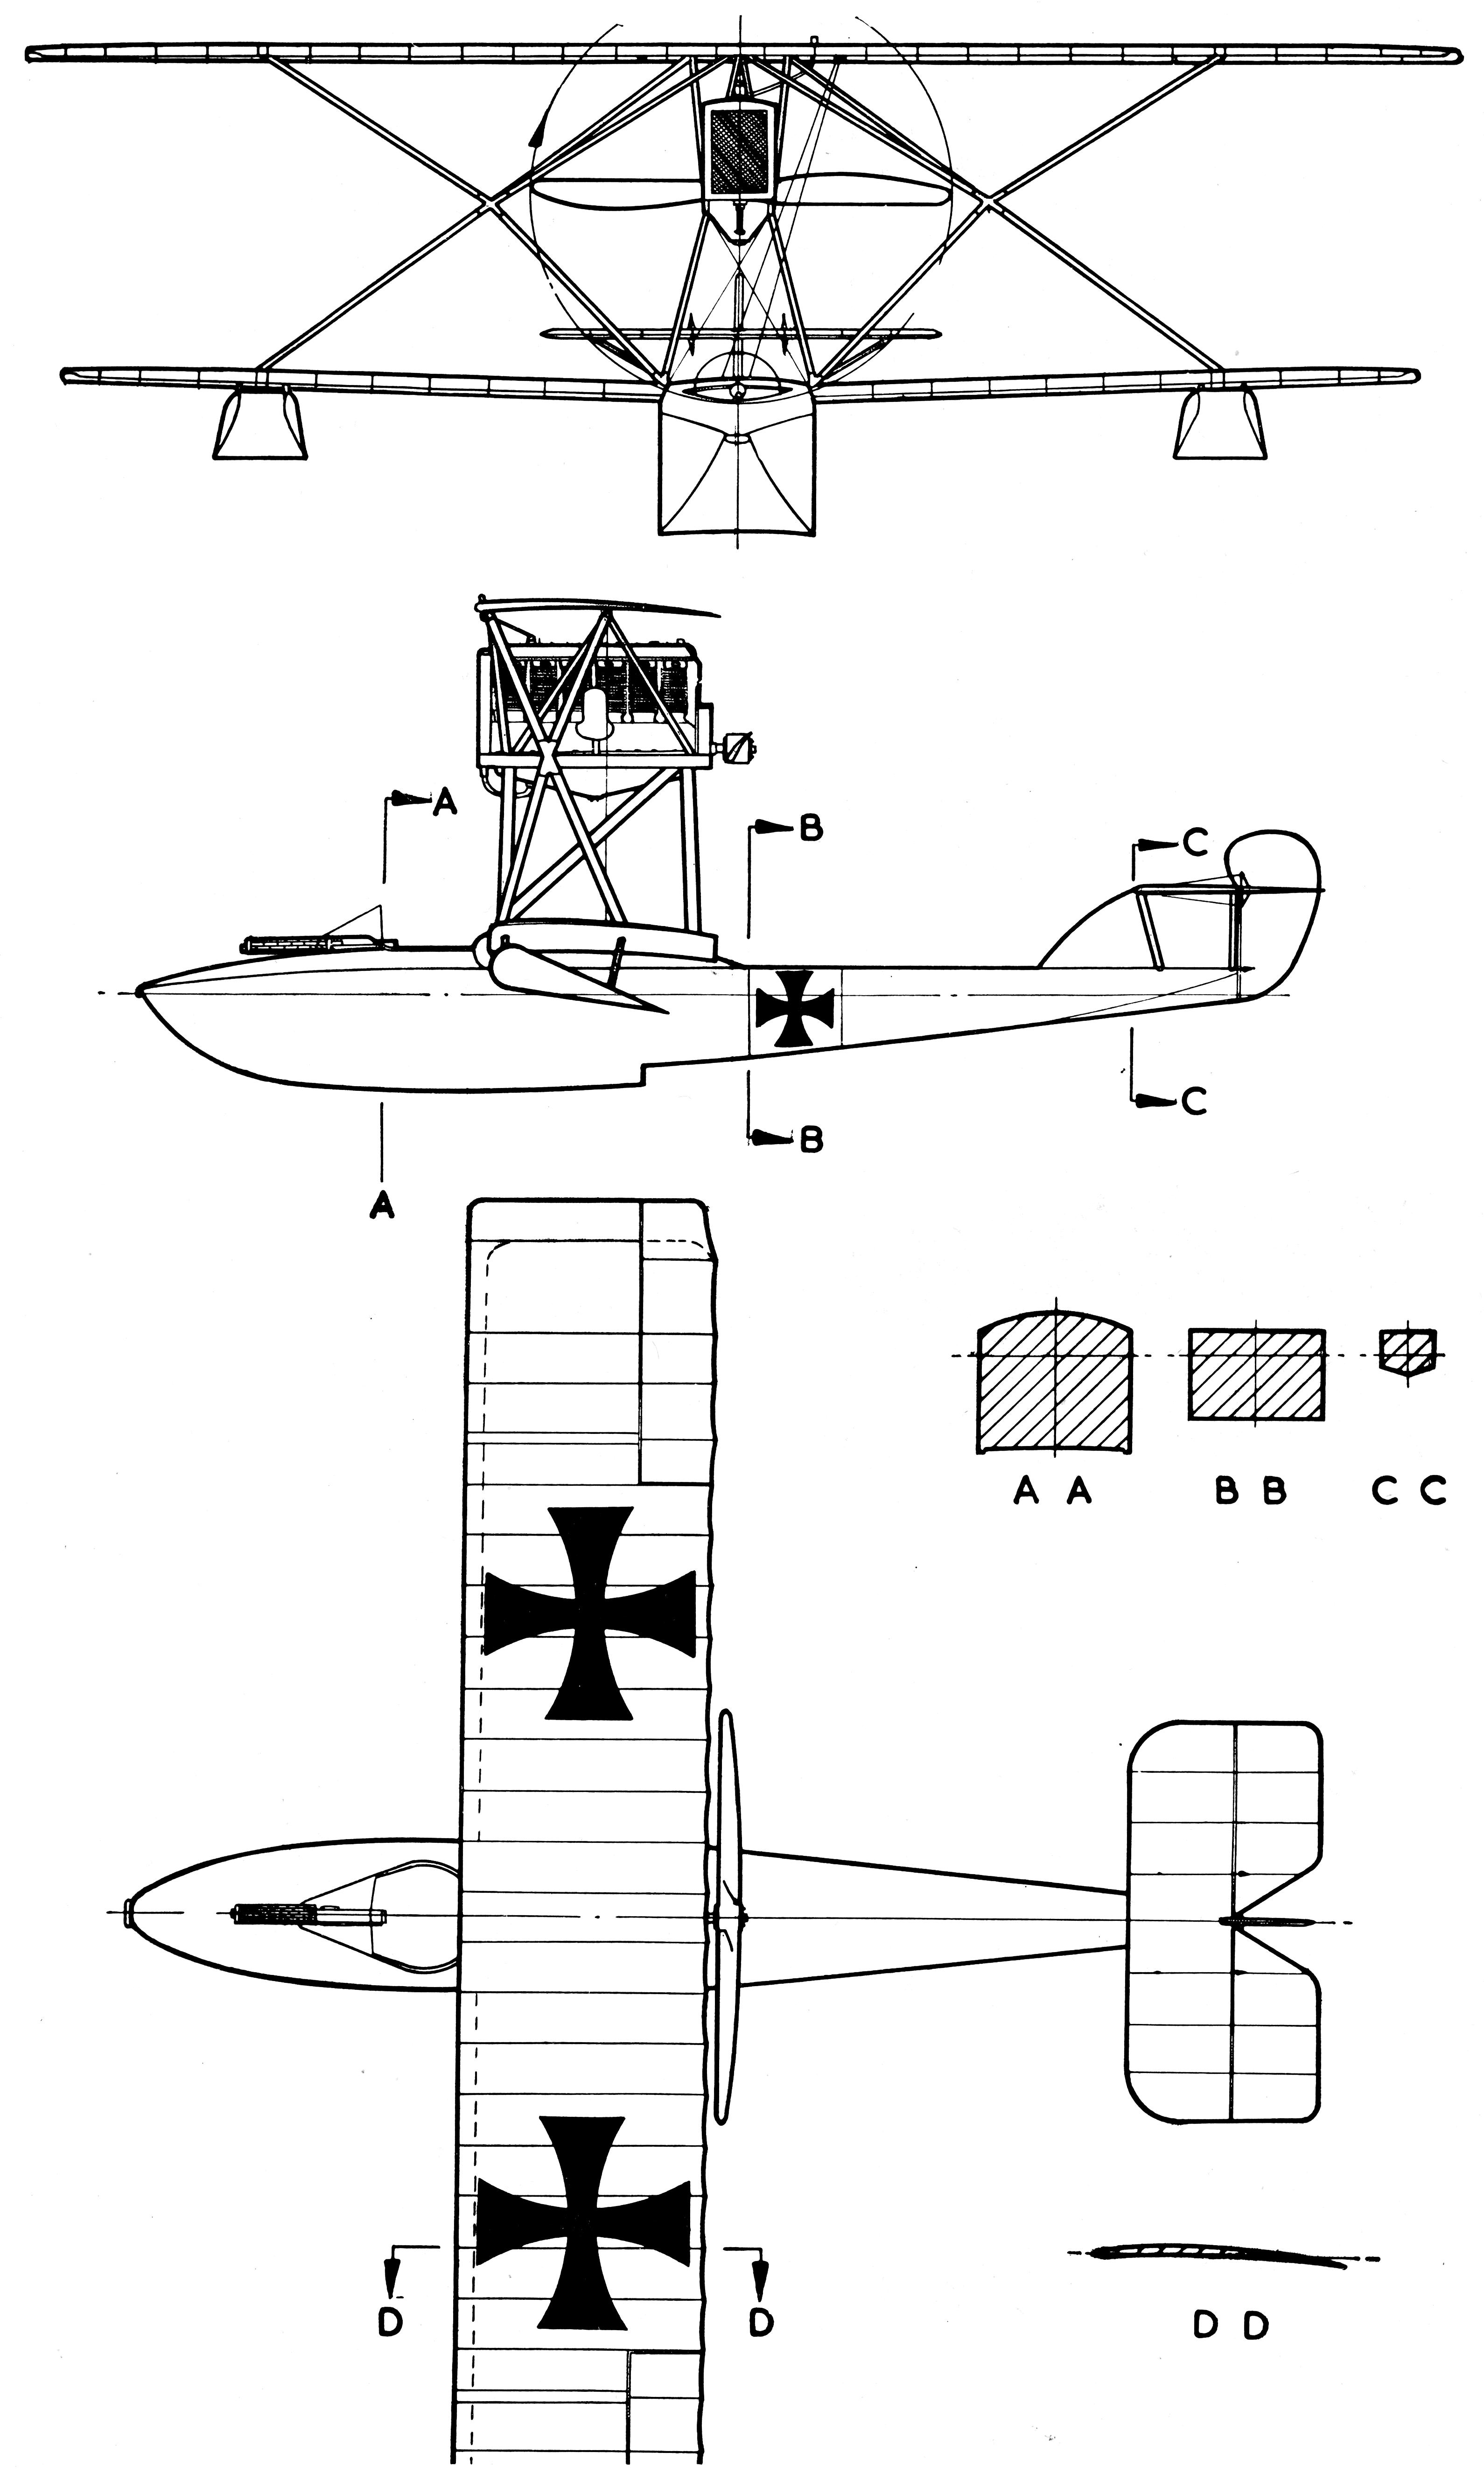 Hansa Brandenburg Cc Blueprint